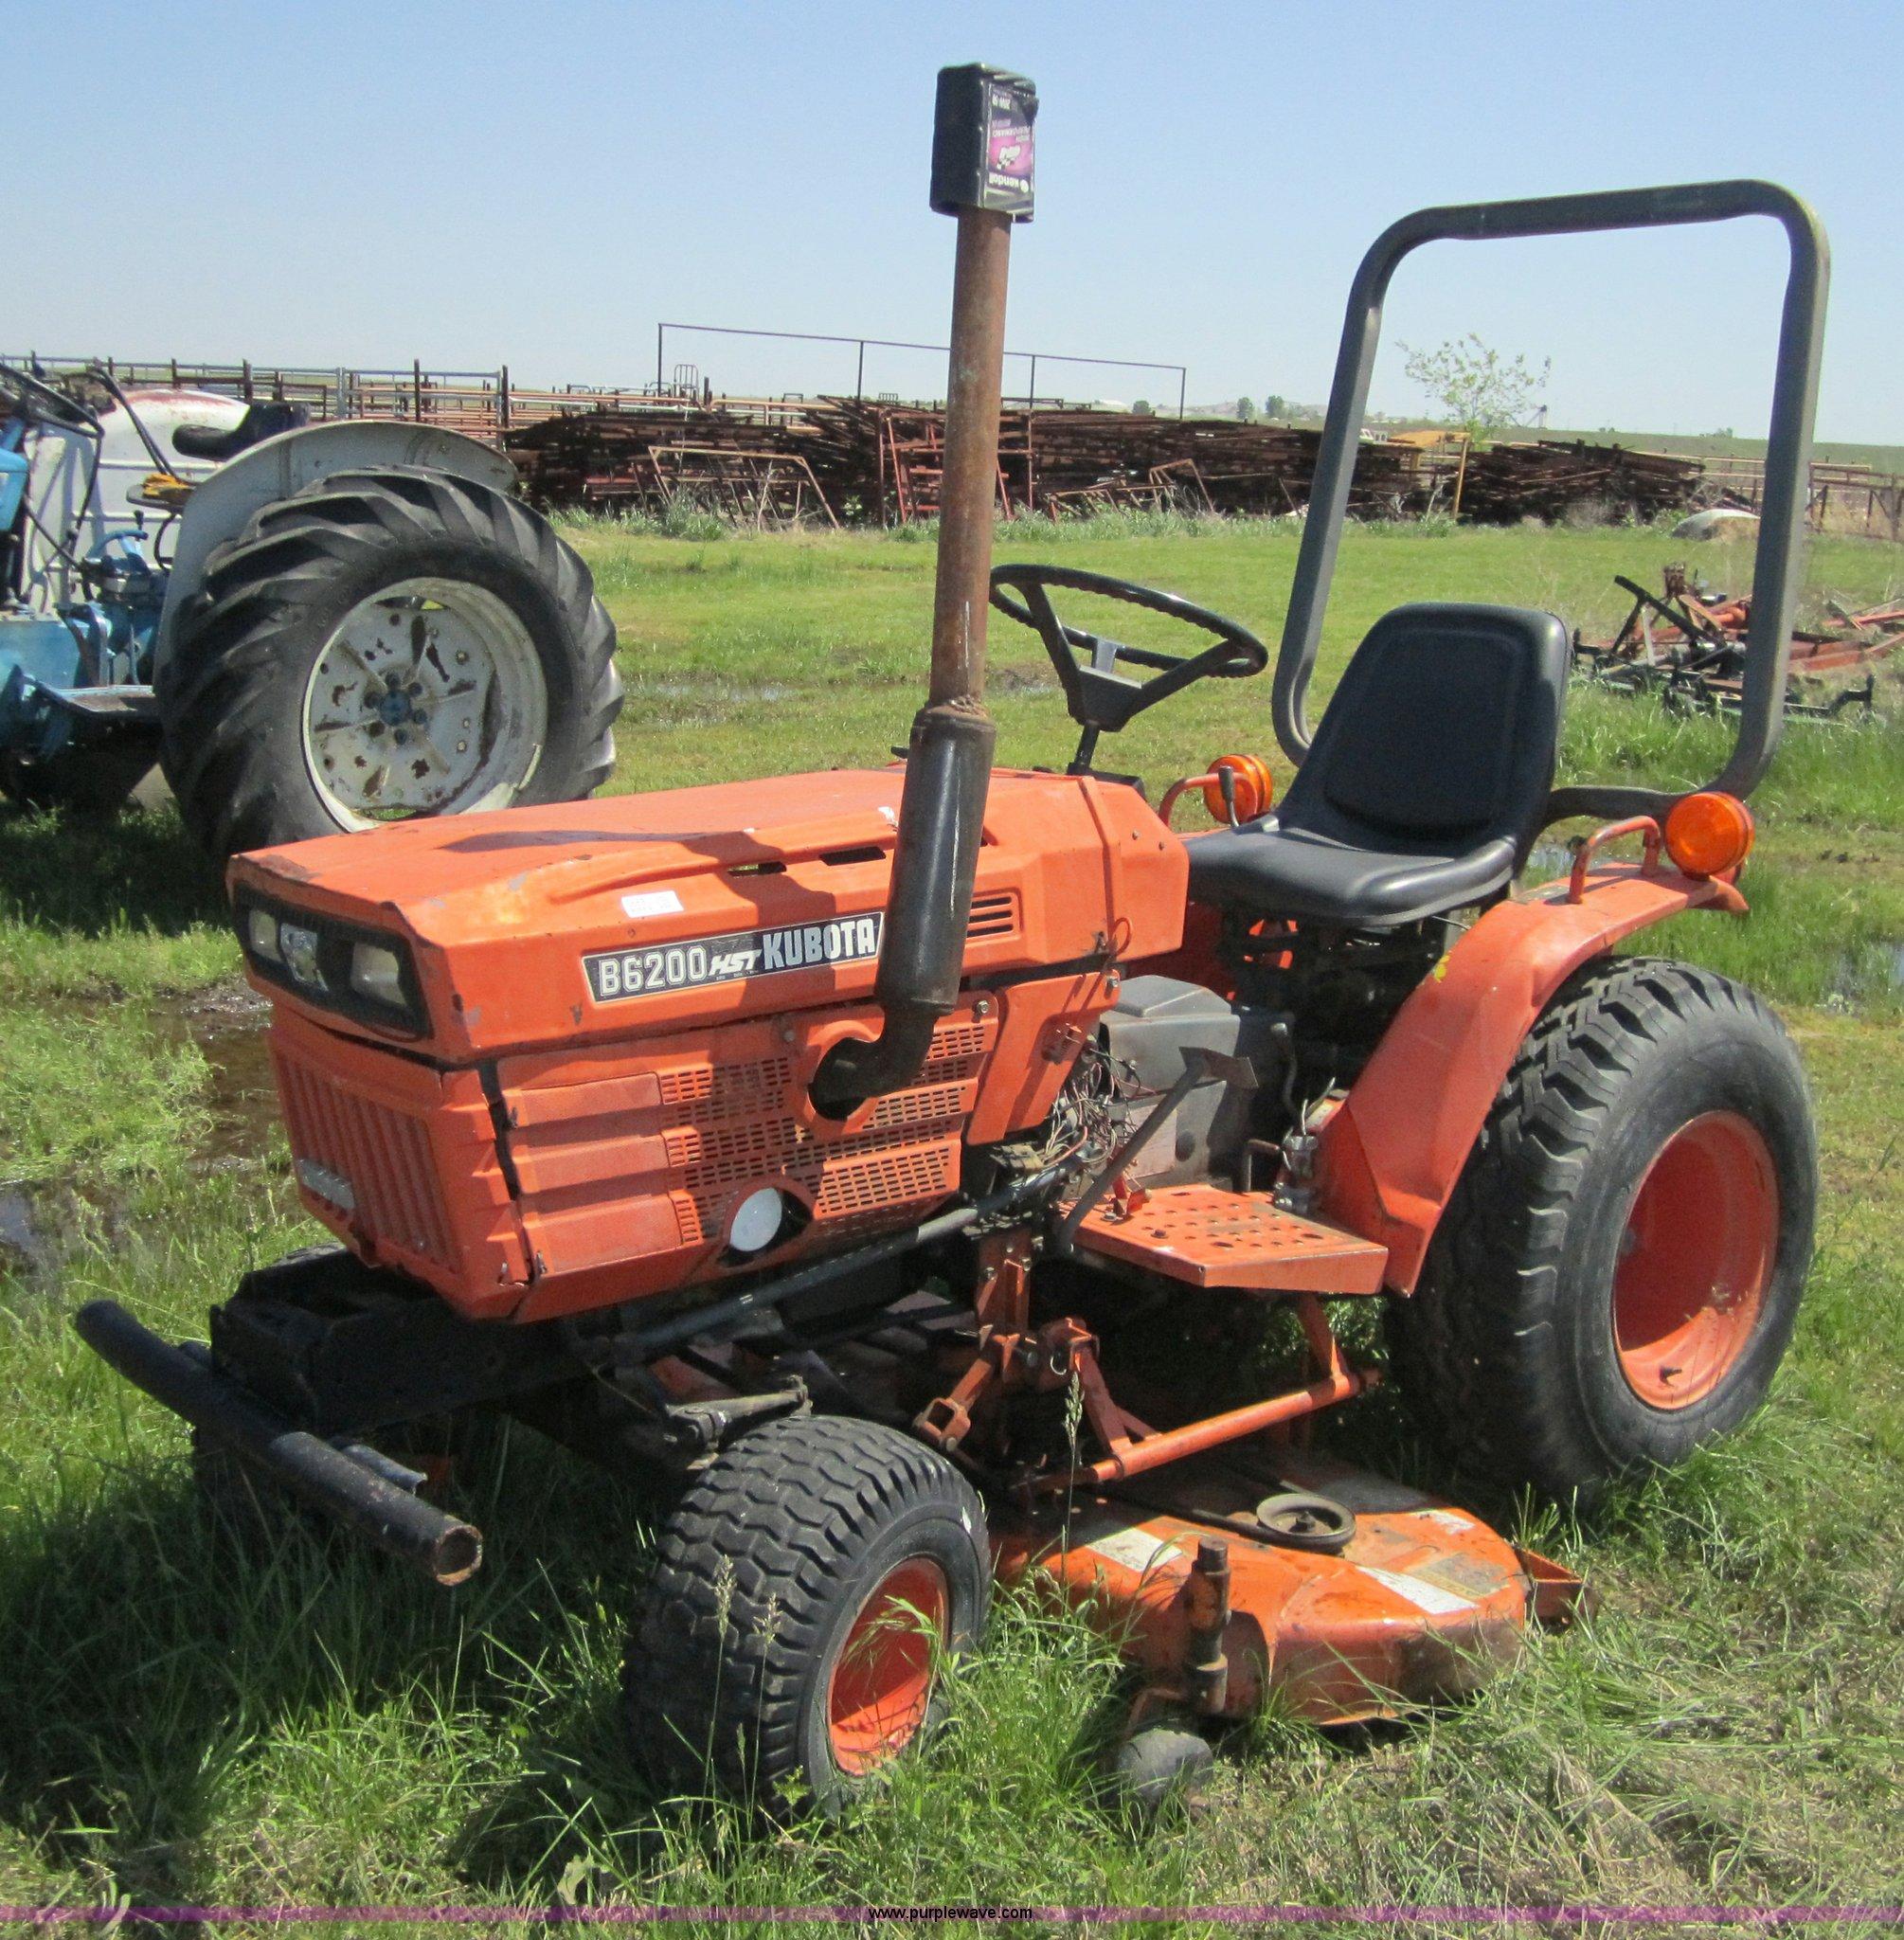 Kubota Lawn Tractor >> Kubota B6200 Hst Lawn Tractor Item 3688 Sold June 8 Okl